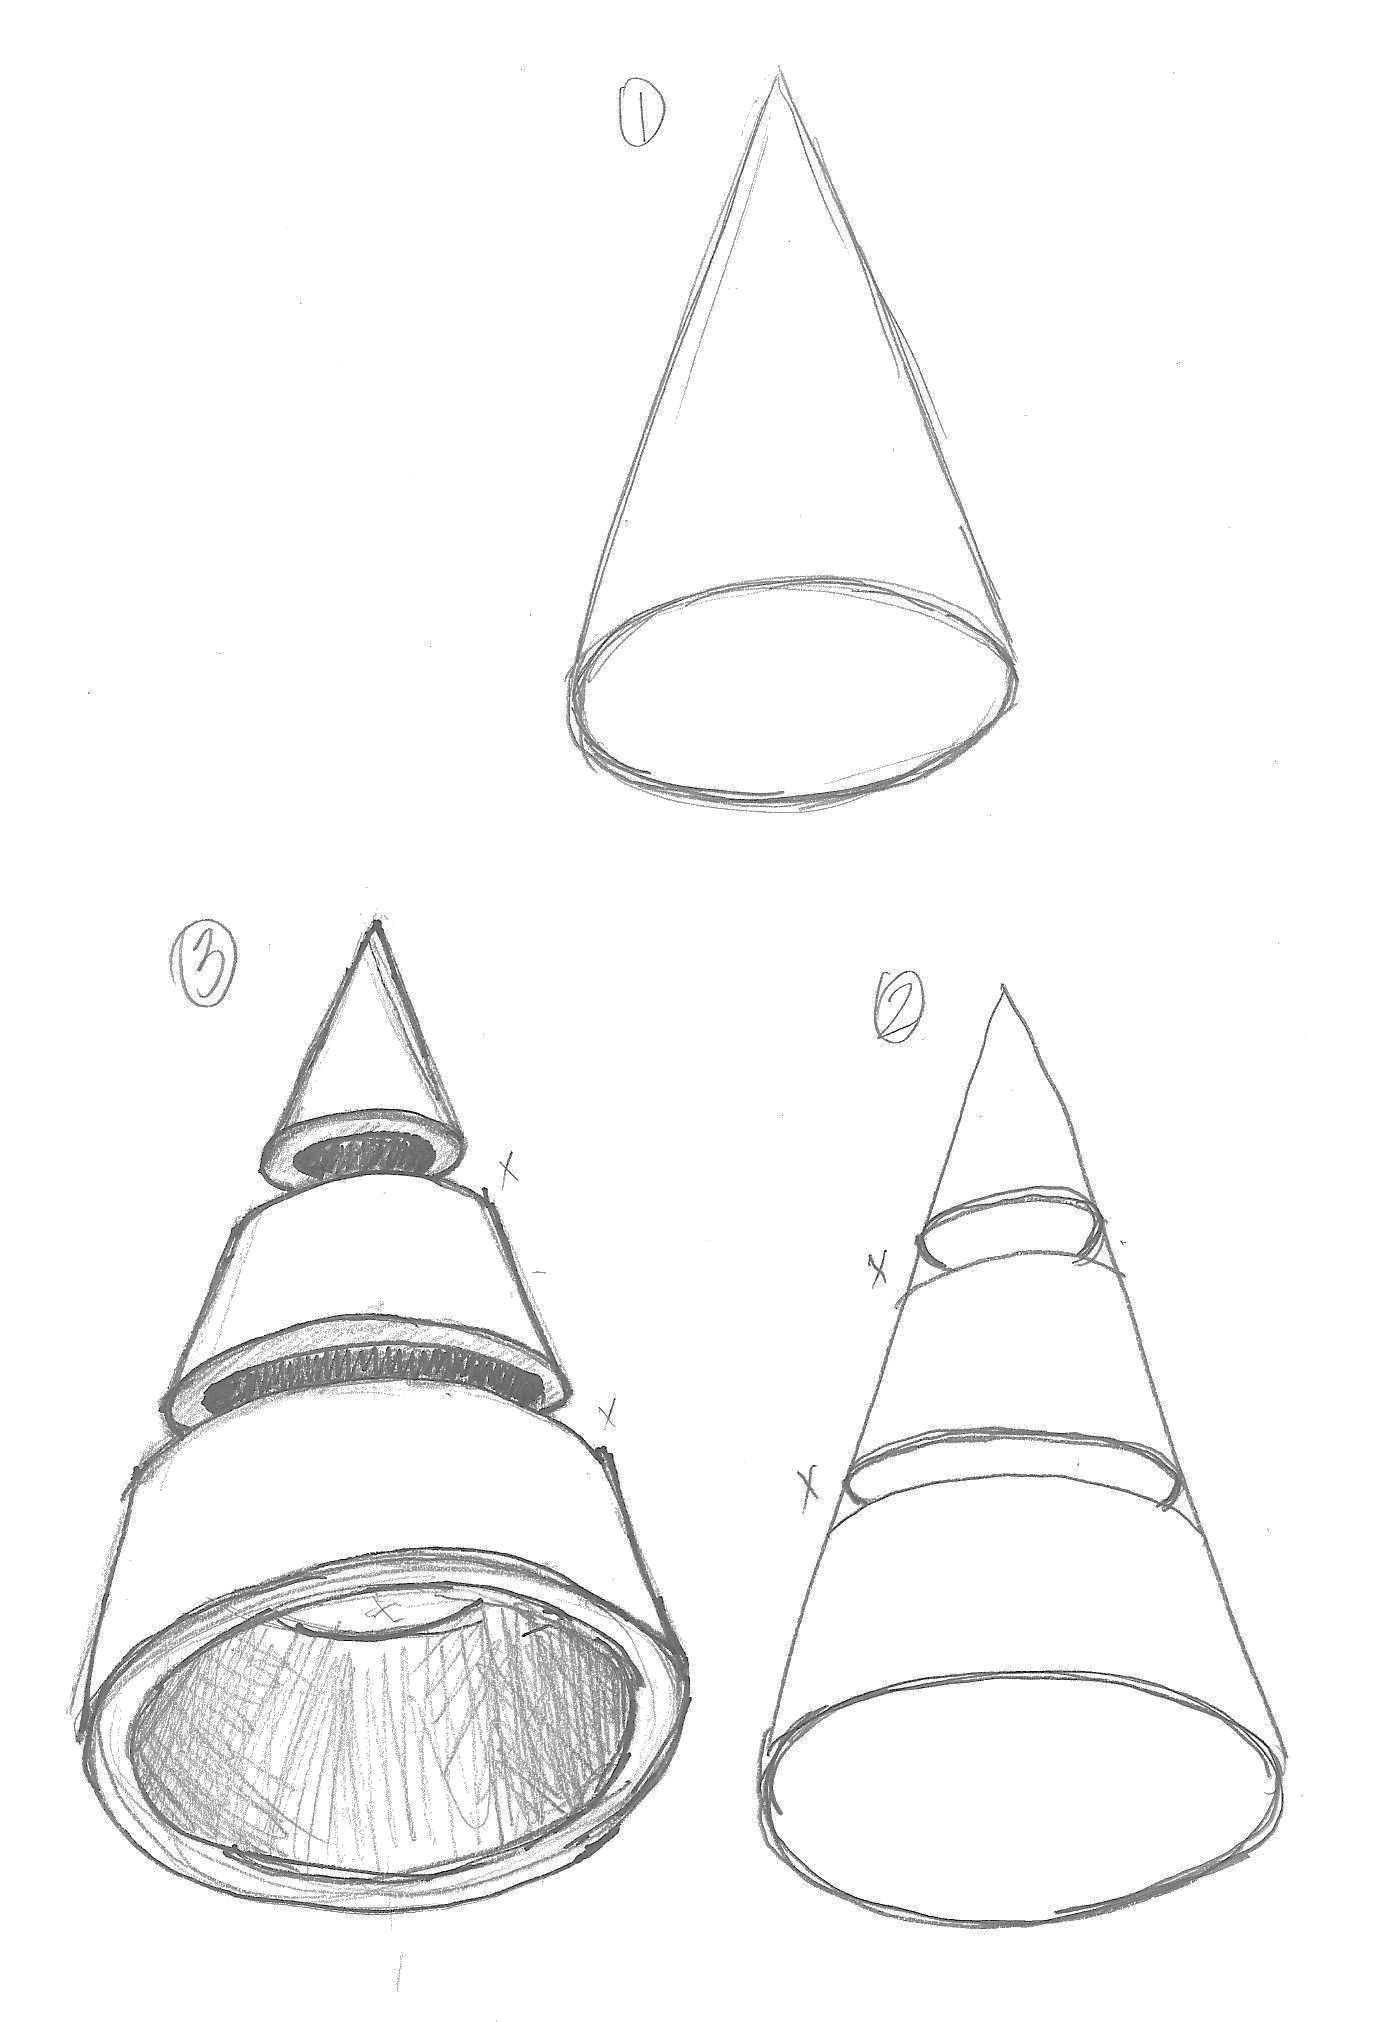 3d Cone Drawing At Getdrawings